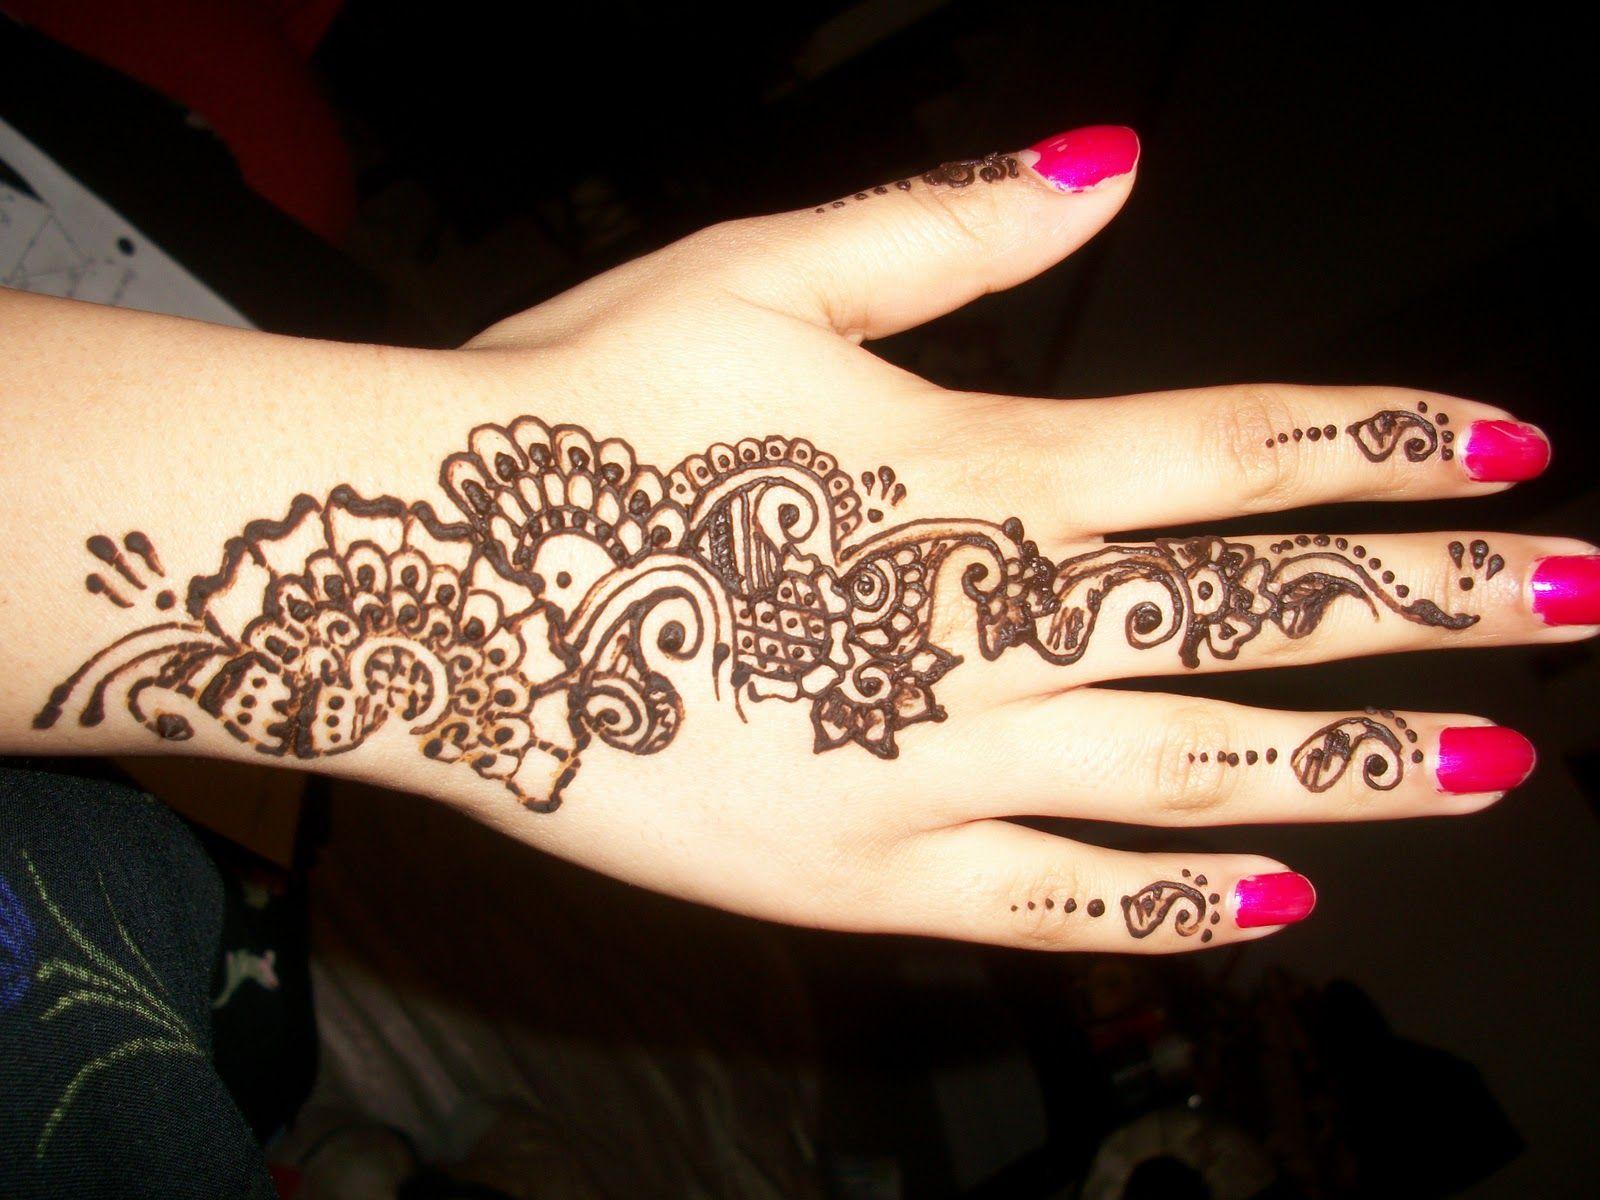 50 intricate henna tattoo designs art and design 50 - Foot Henna Flower Floral Henna Designs For Hand Feet Arabic Beginners Kids Men